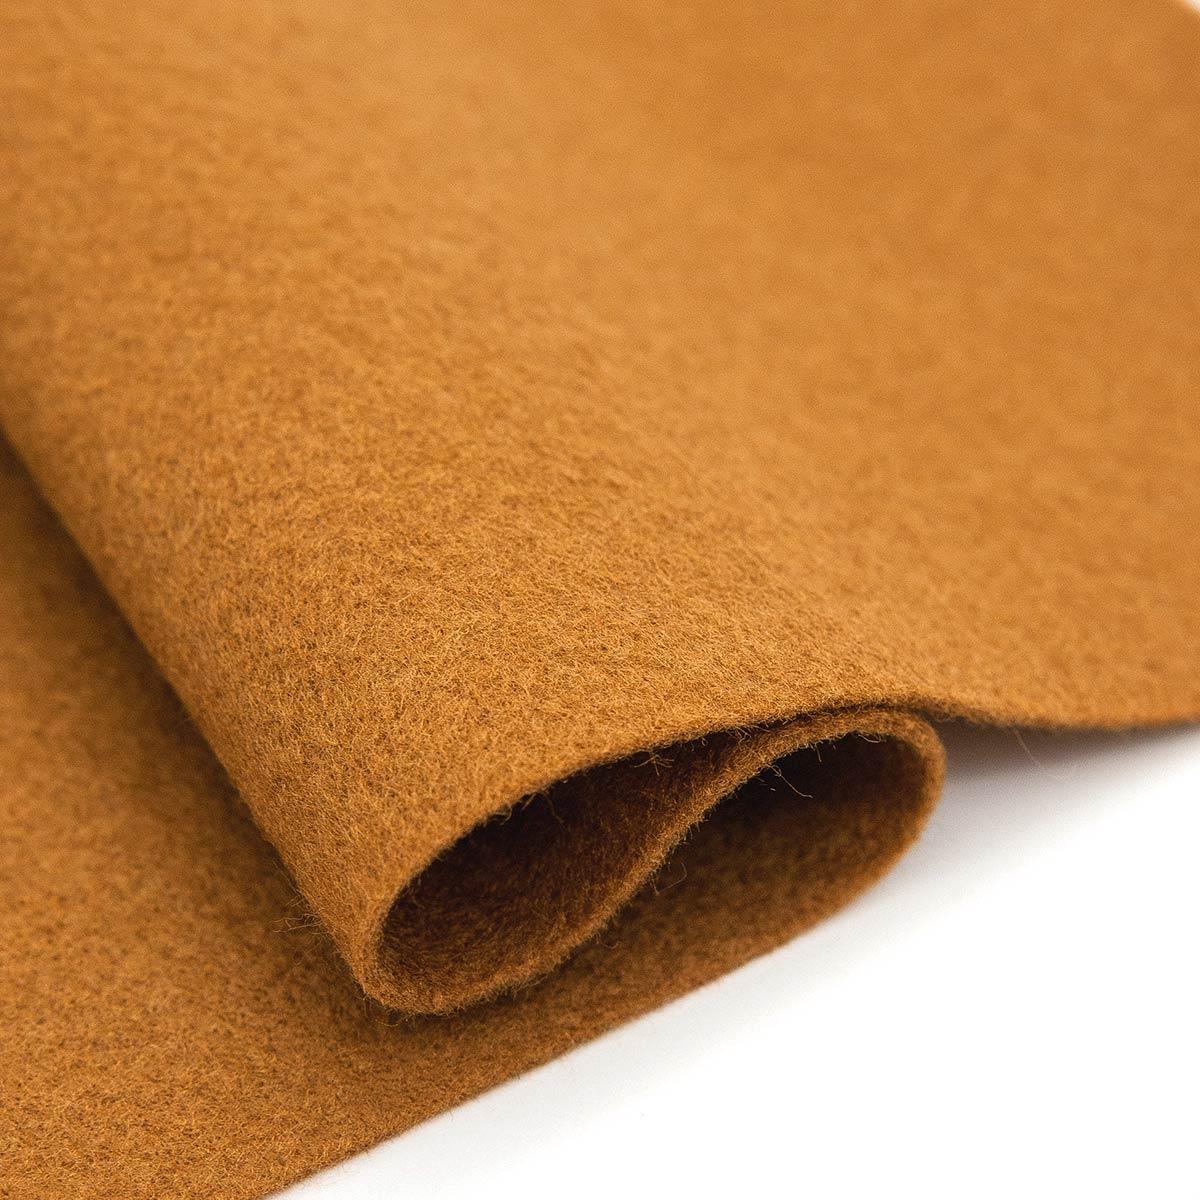 61212673 Фетр для творчества, светло-коричневый, 2мм, 20x30см, уп./1шт. Glorex